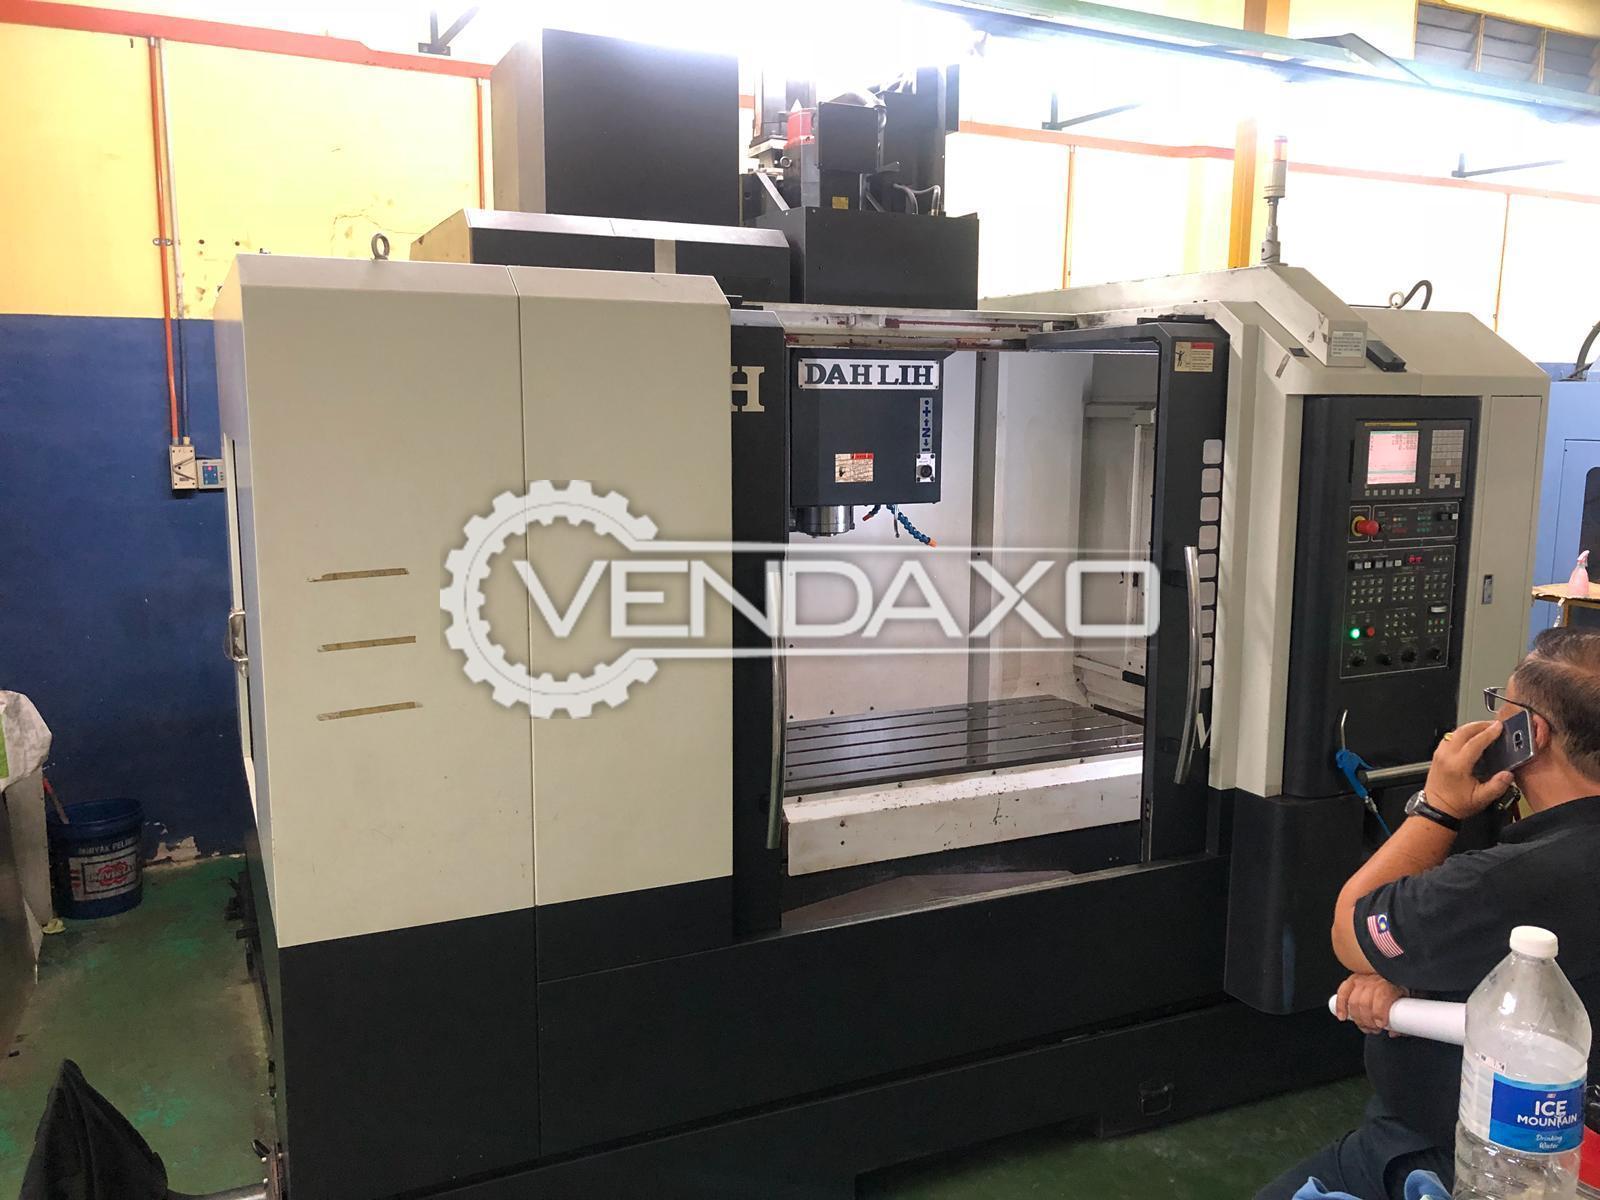 DAHLIH MCV-1200 CNC Vertical Machining Center - Table Size - 1220 x 620 MM